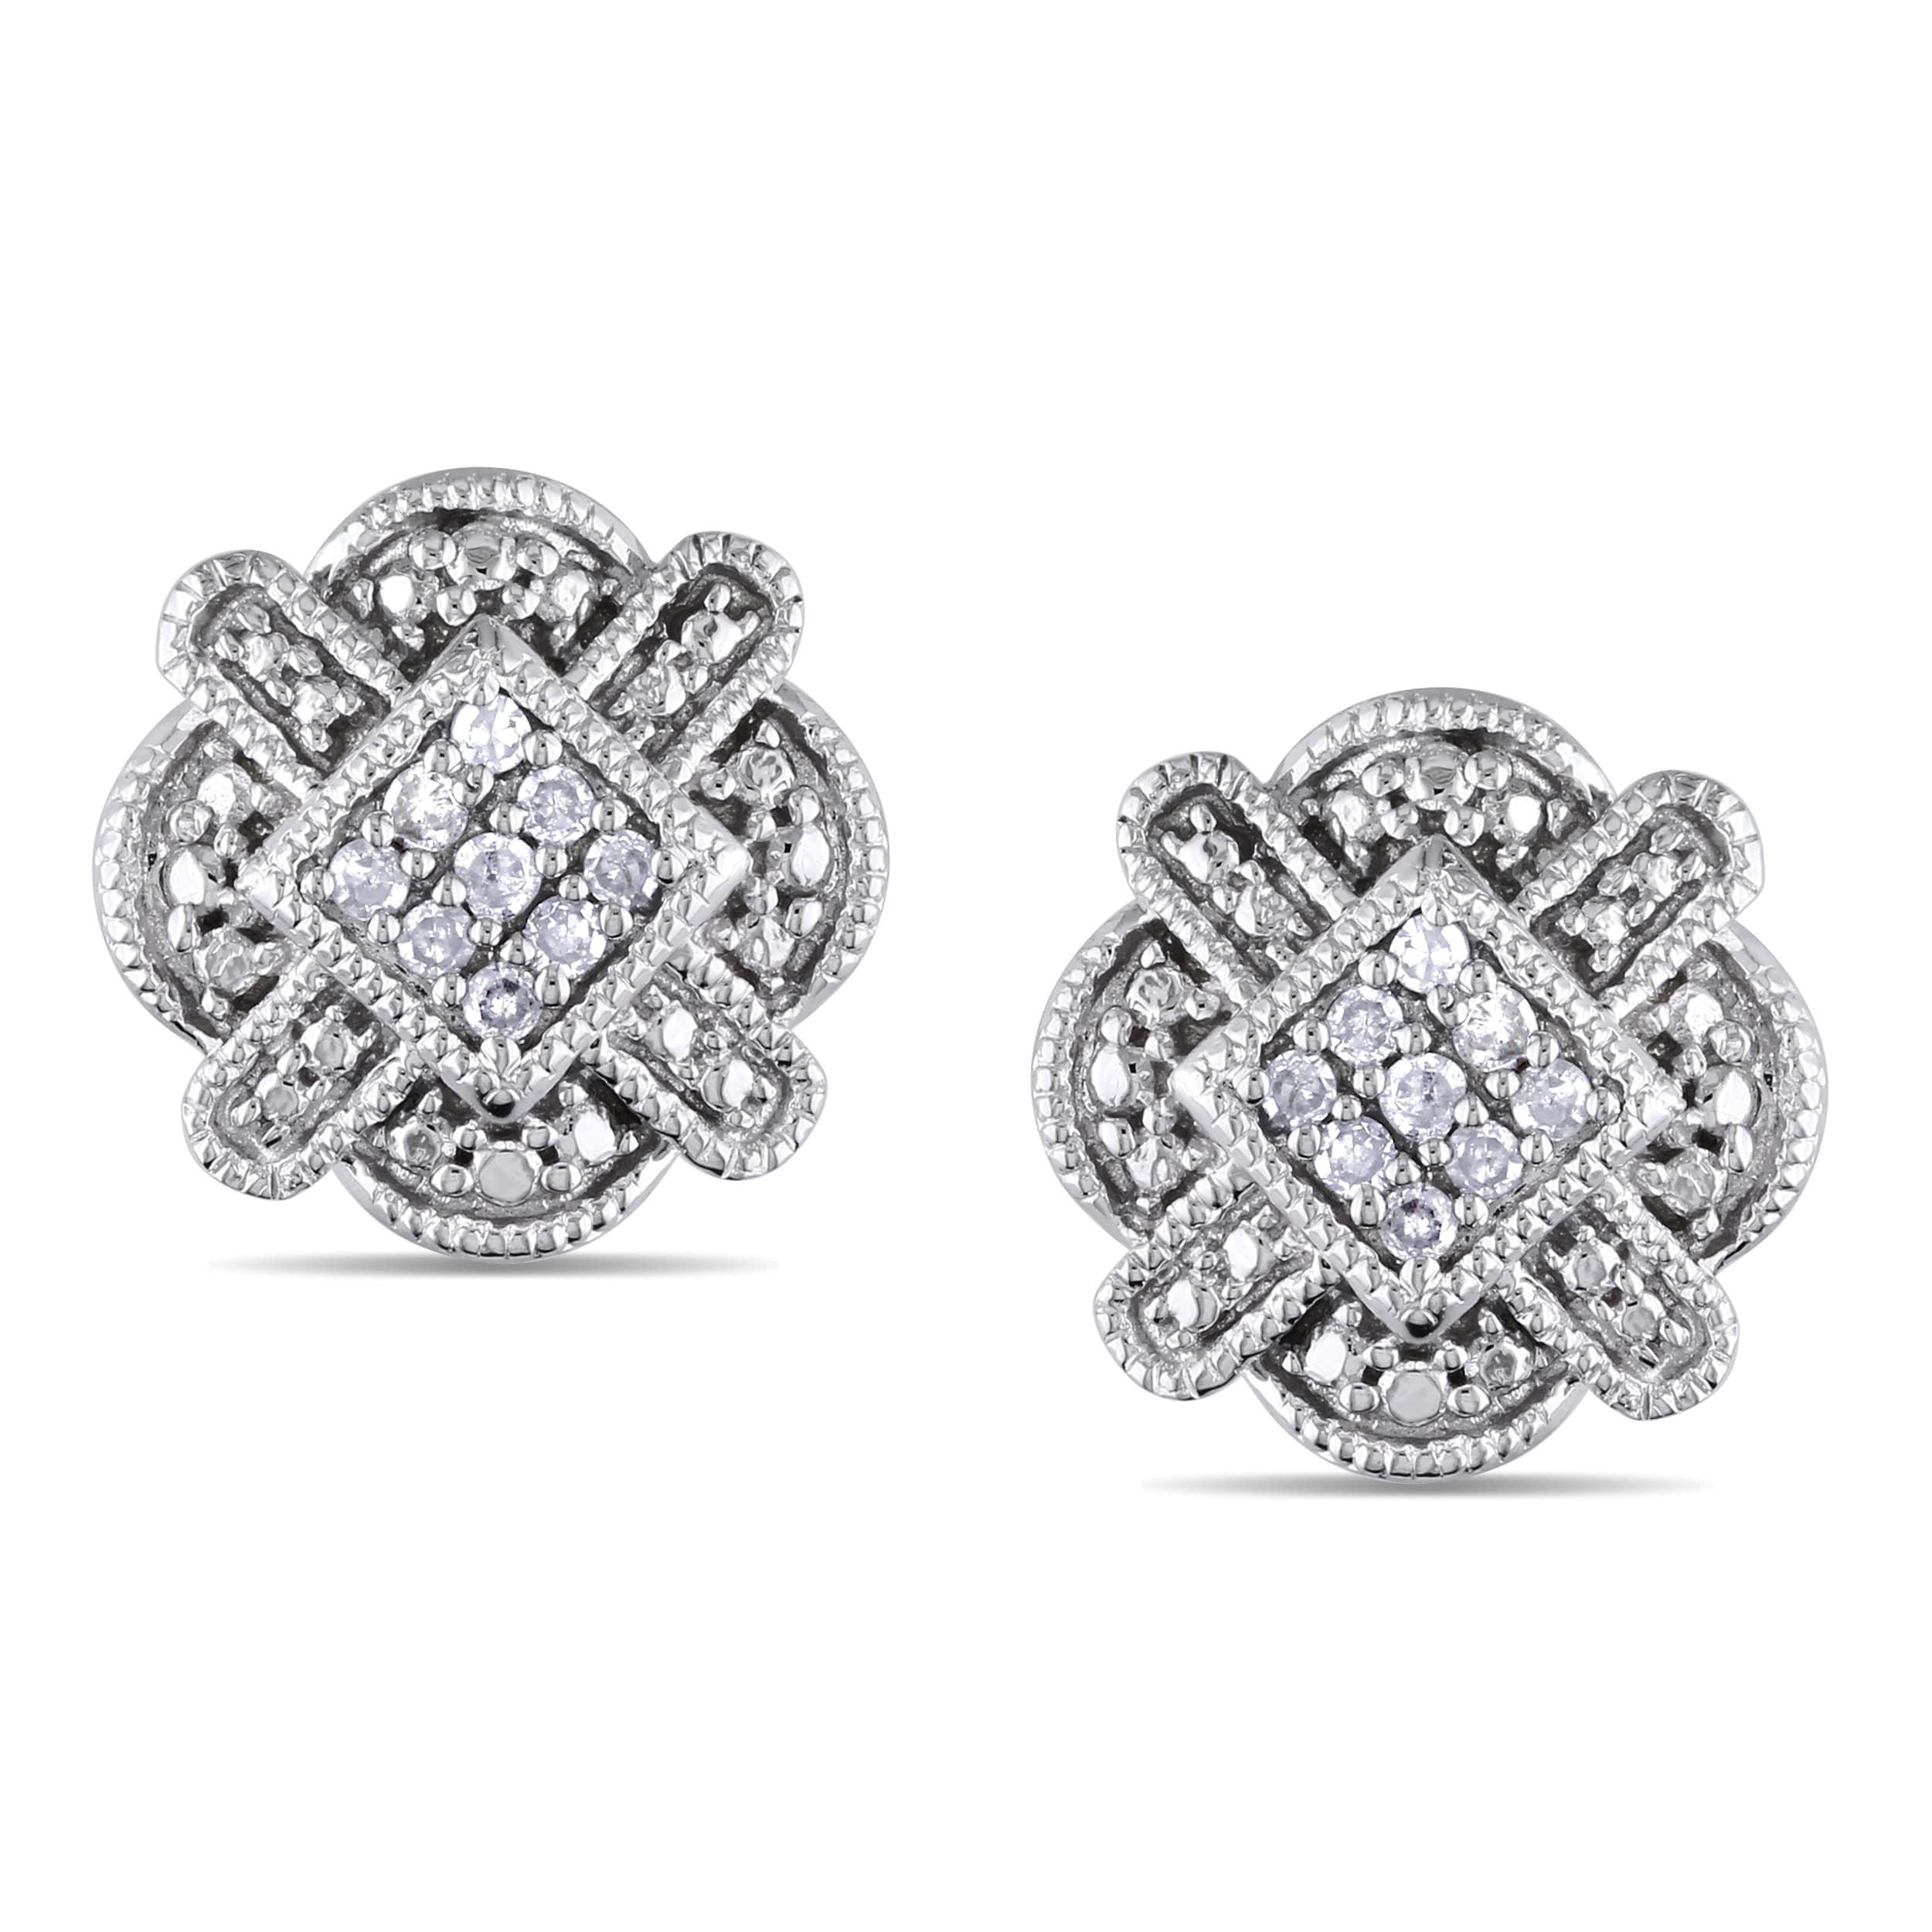 Miadora 10k White Gold 1/10ct TDW Diamond Stud Earrings (G-H, I1-I2)